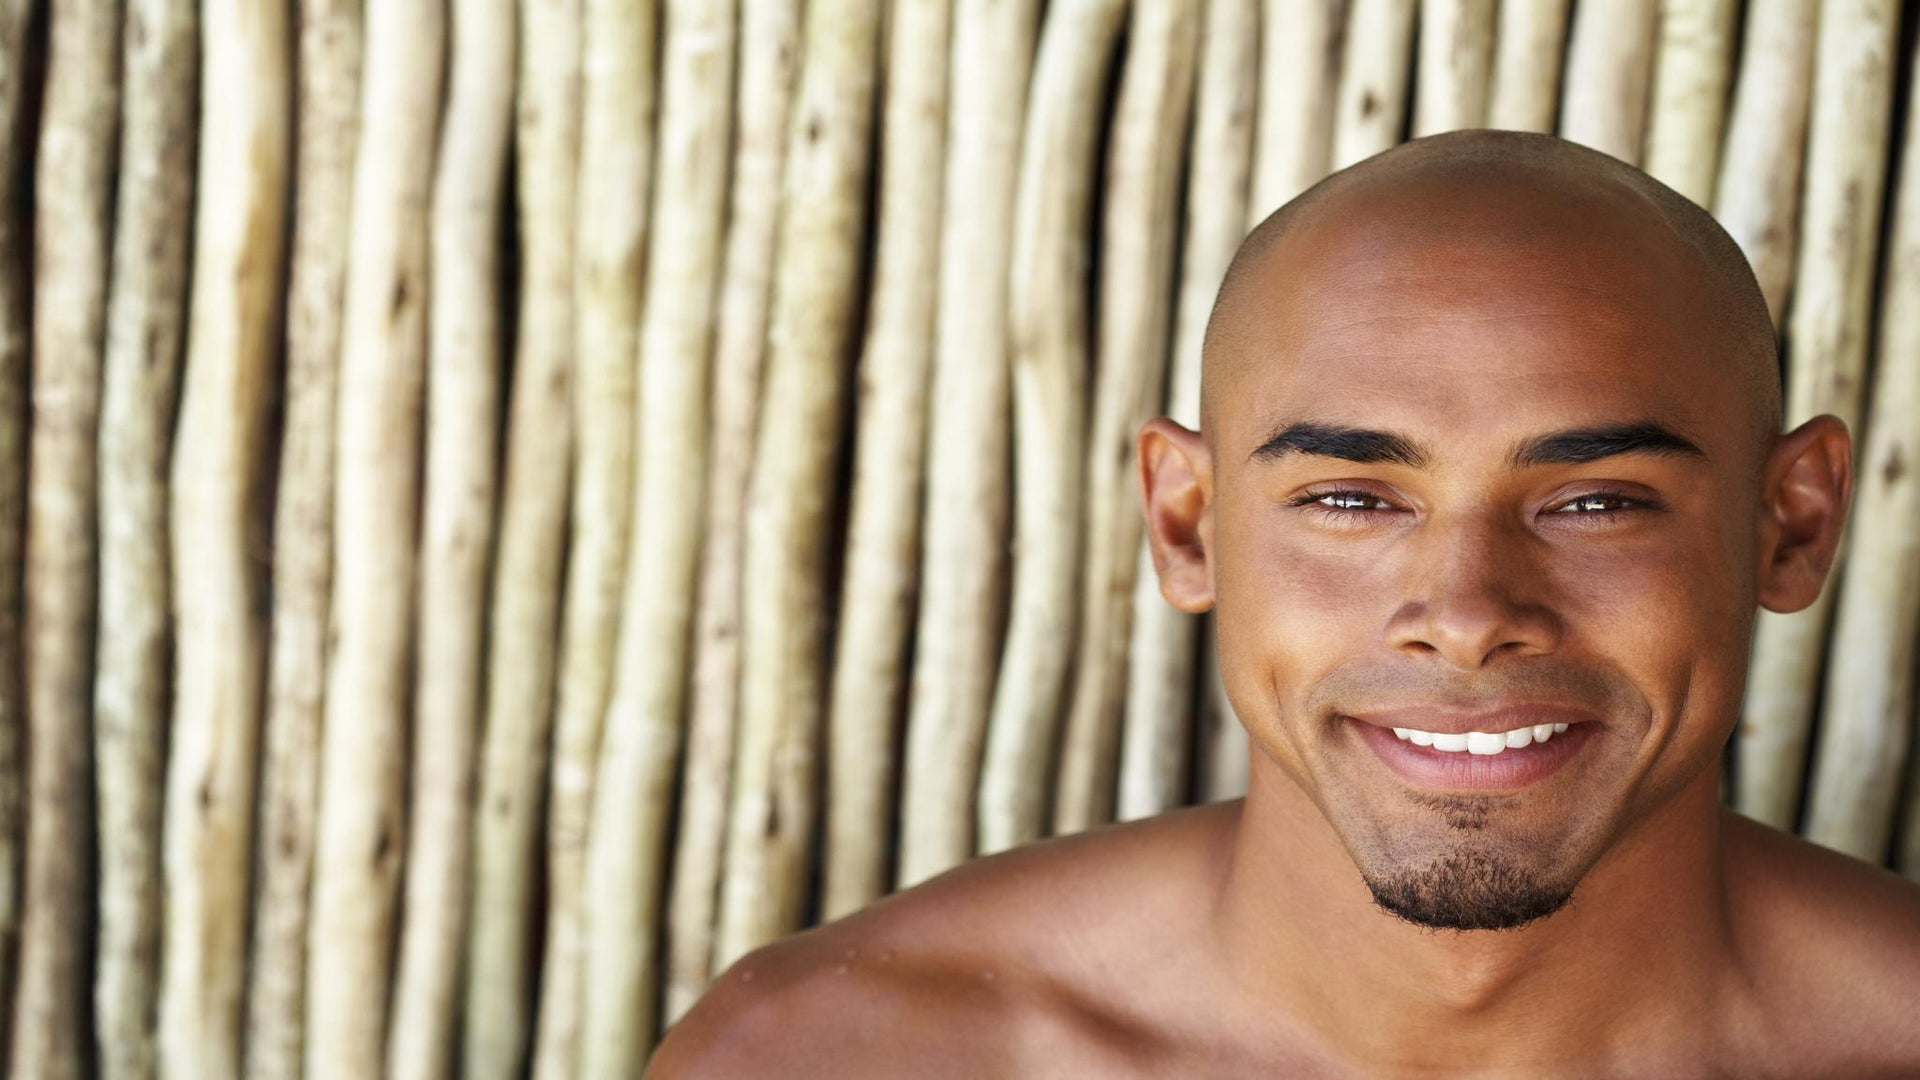 Super Natural: Afrobella Pens A Letter to Guys: Bald Is Natural, Too